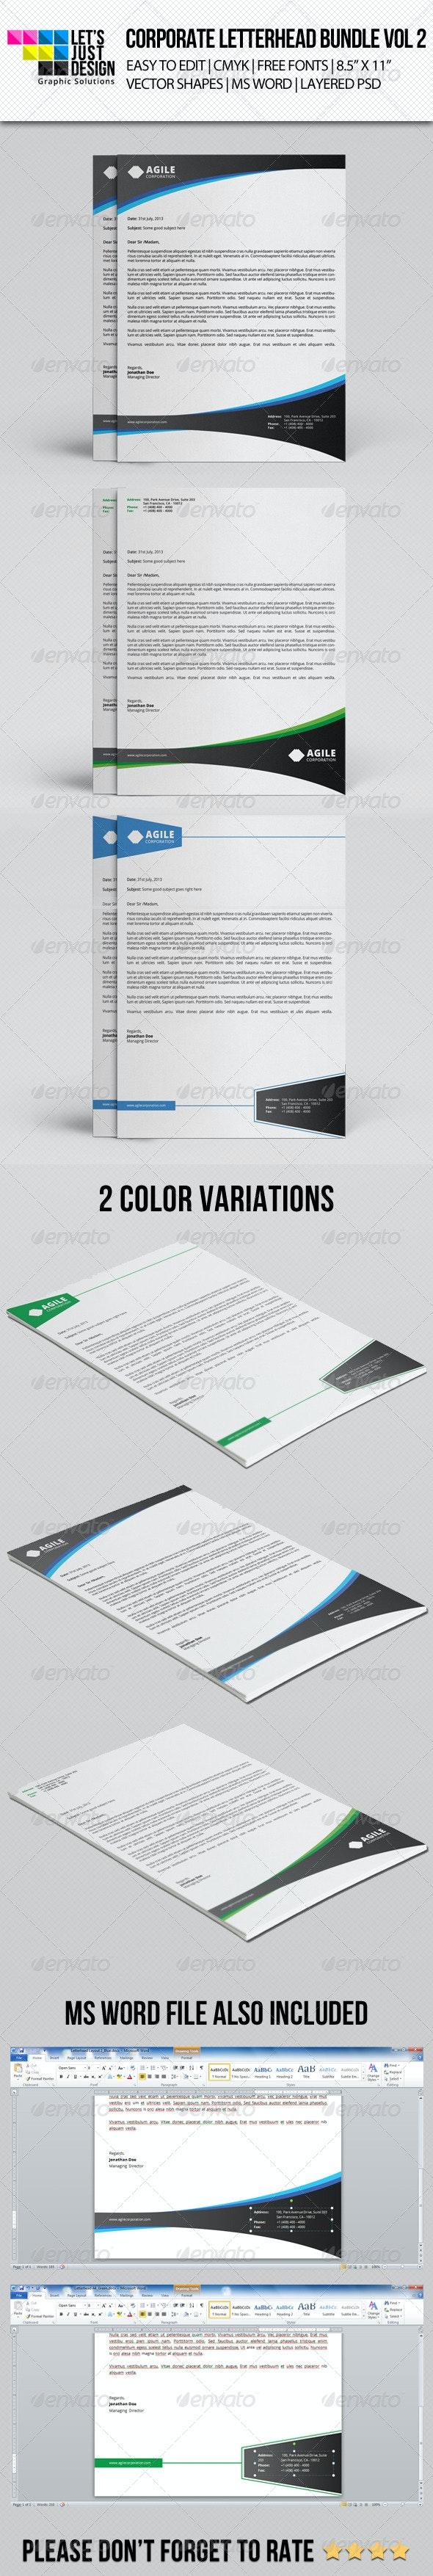 Corporate Letterhead Bundle Vol 2 - Stationery Print Templates